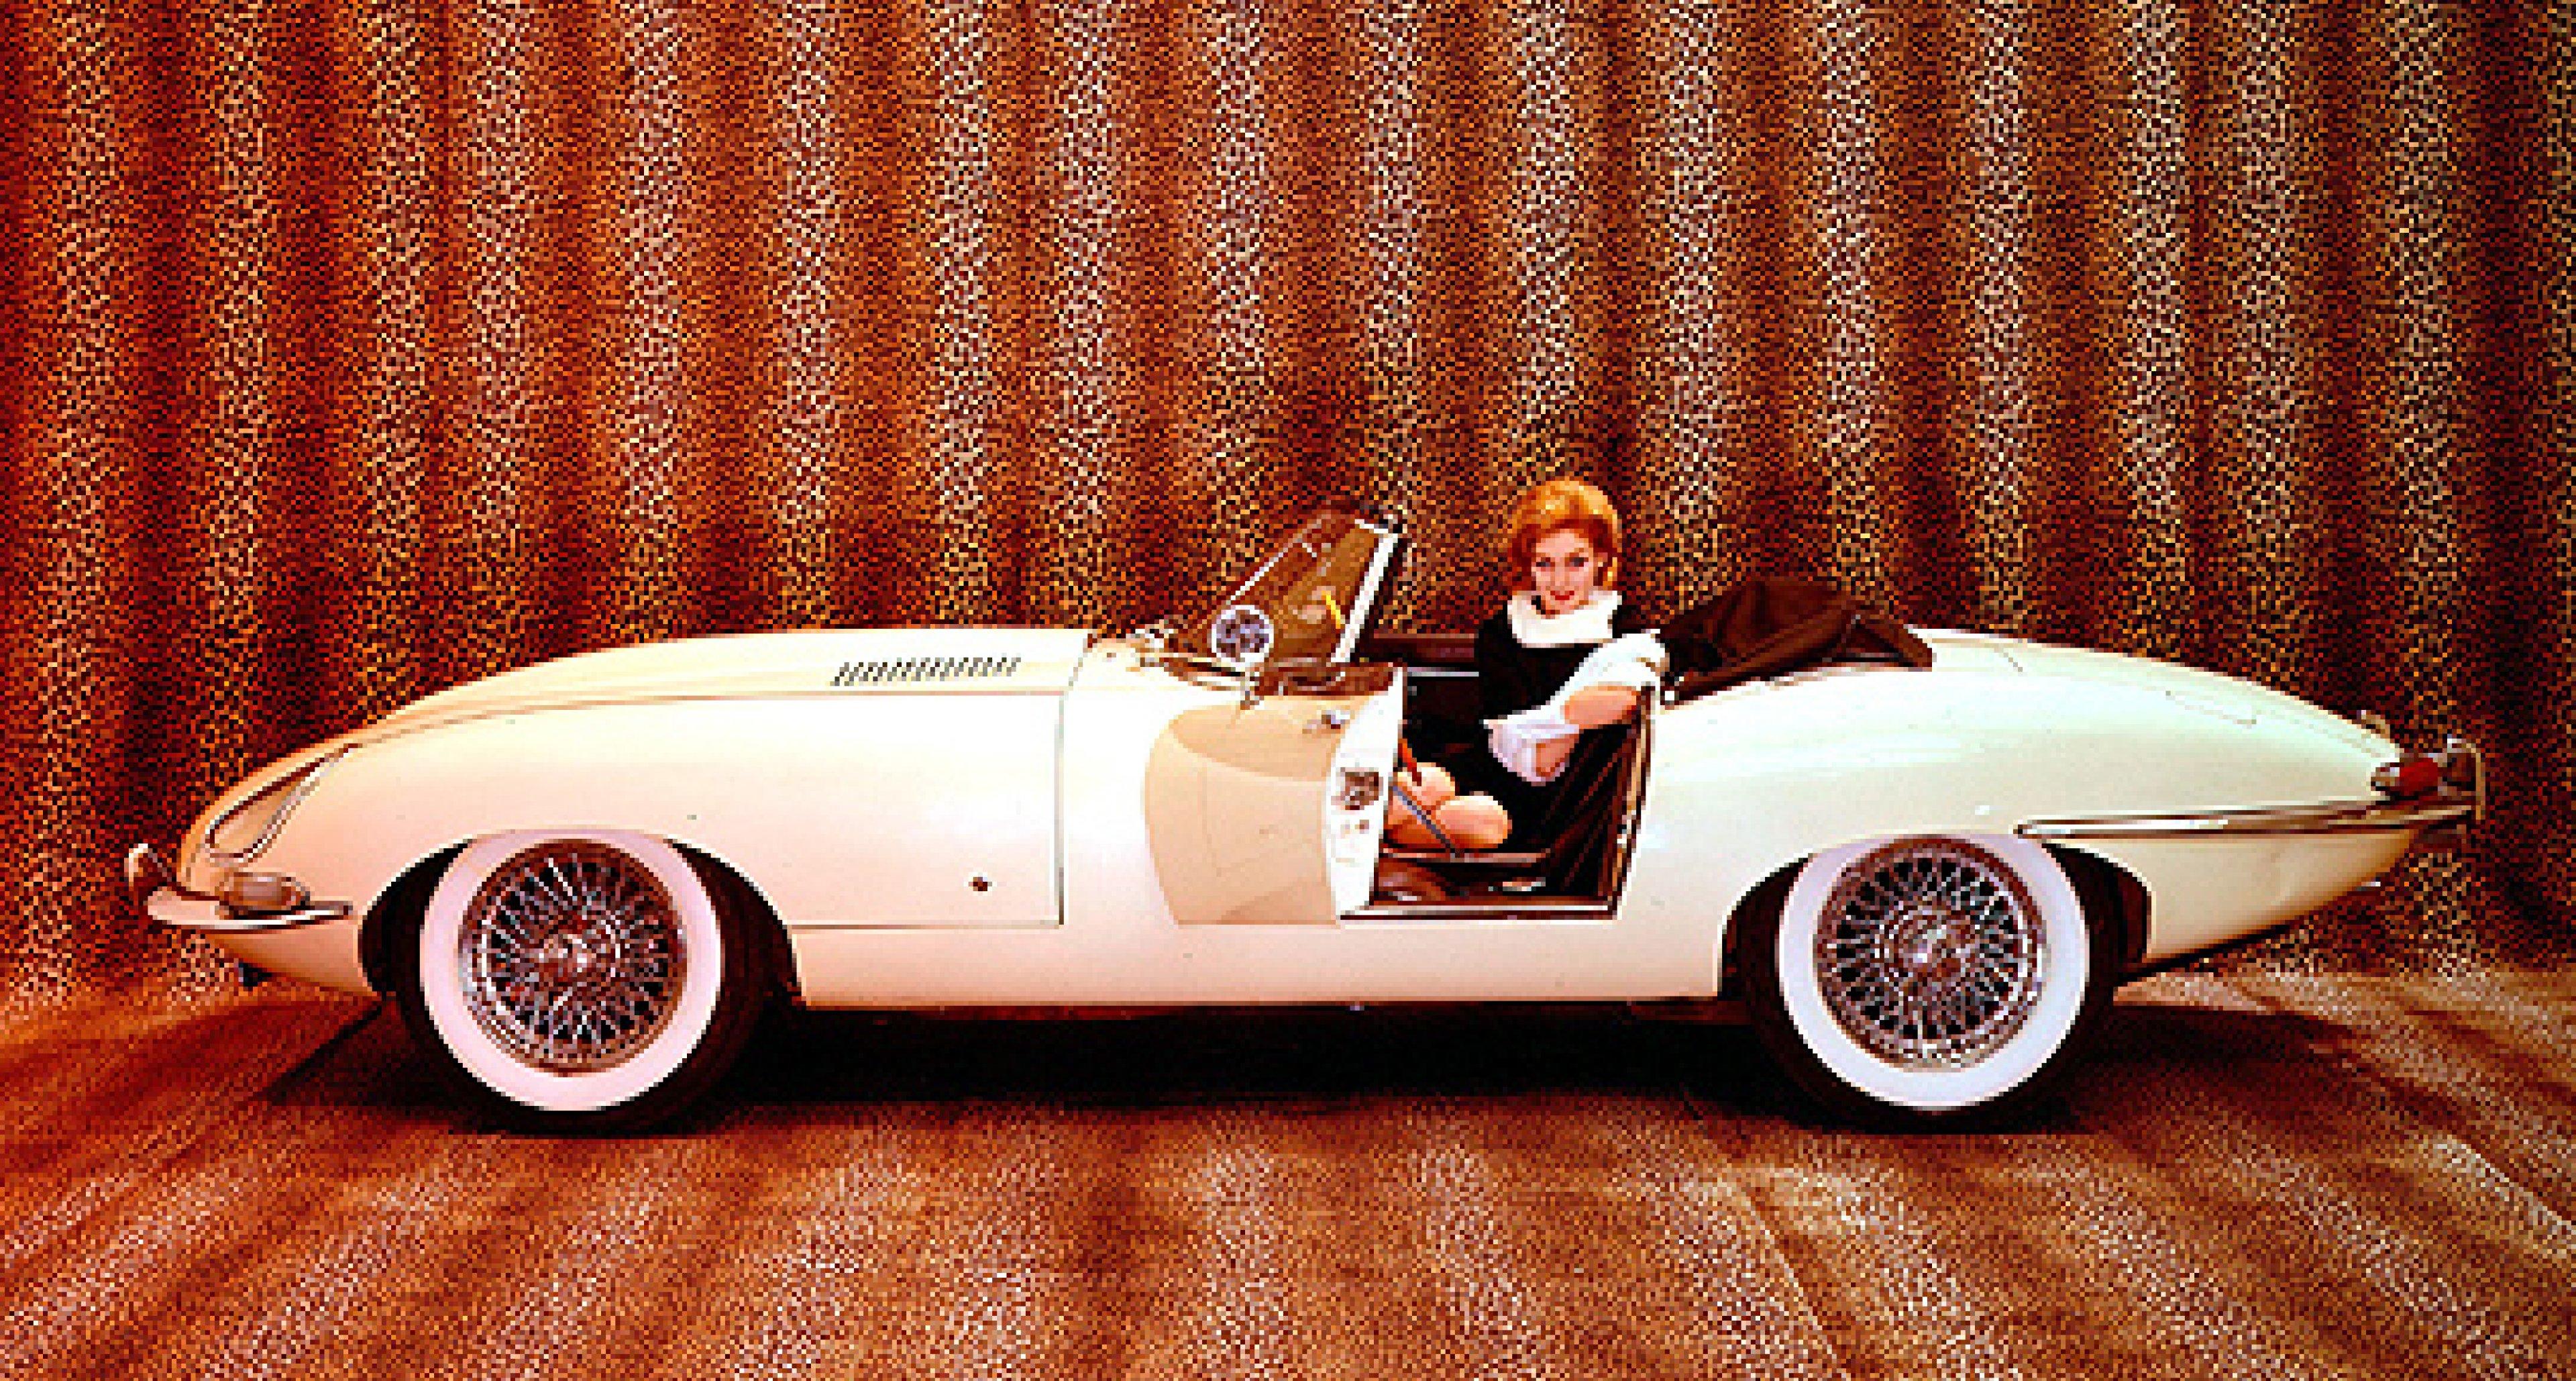 50 Jahre Jaguar E-Type: Jubiläumsfahrt in Genf